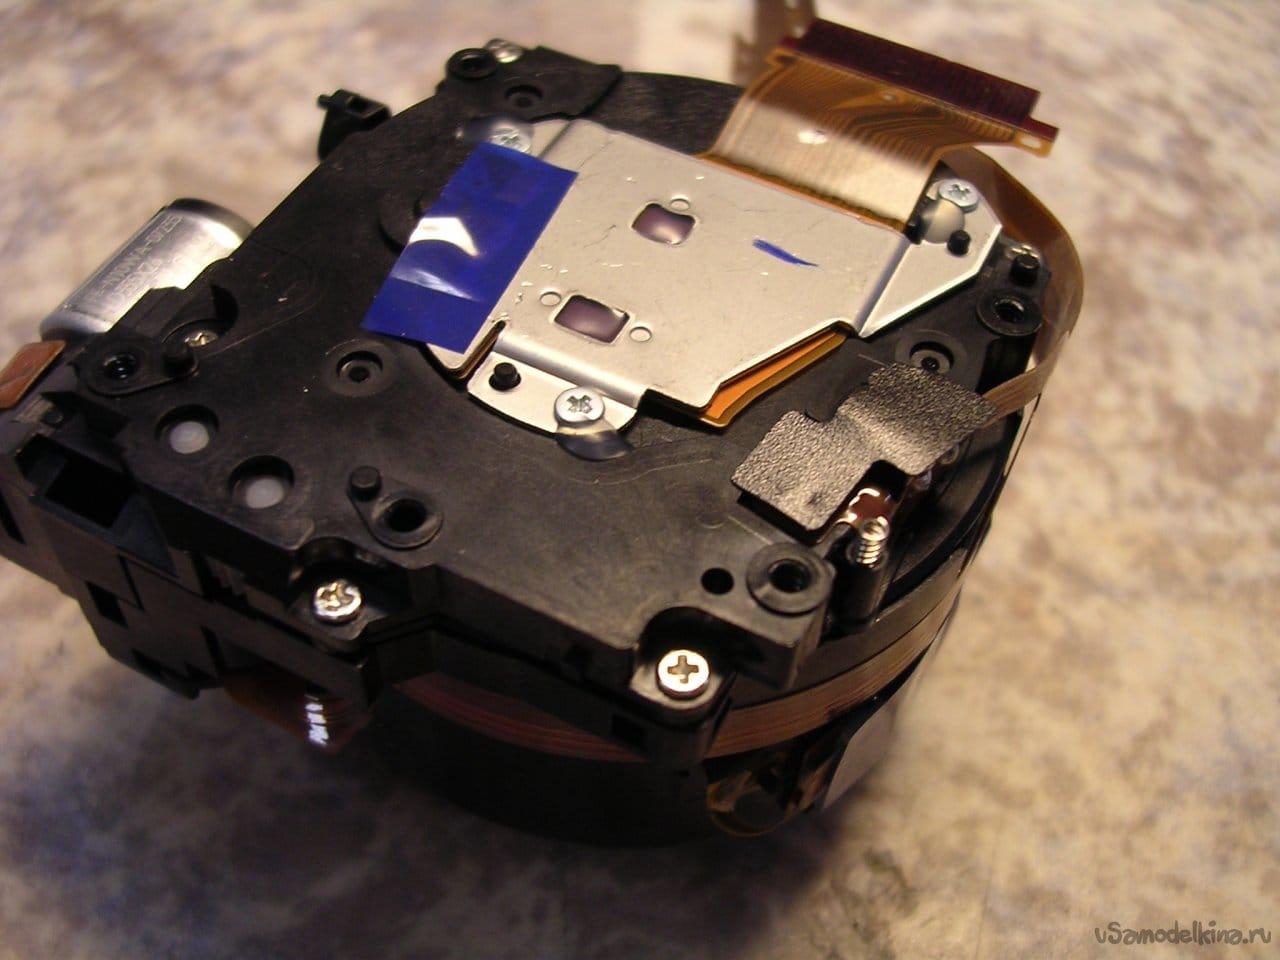 Canon PowerShot S80 collapsed lens repair